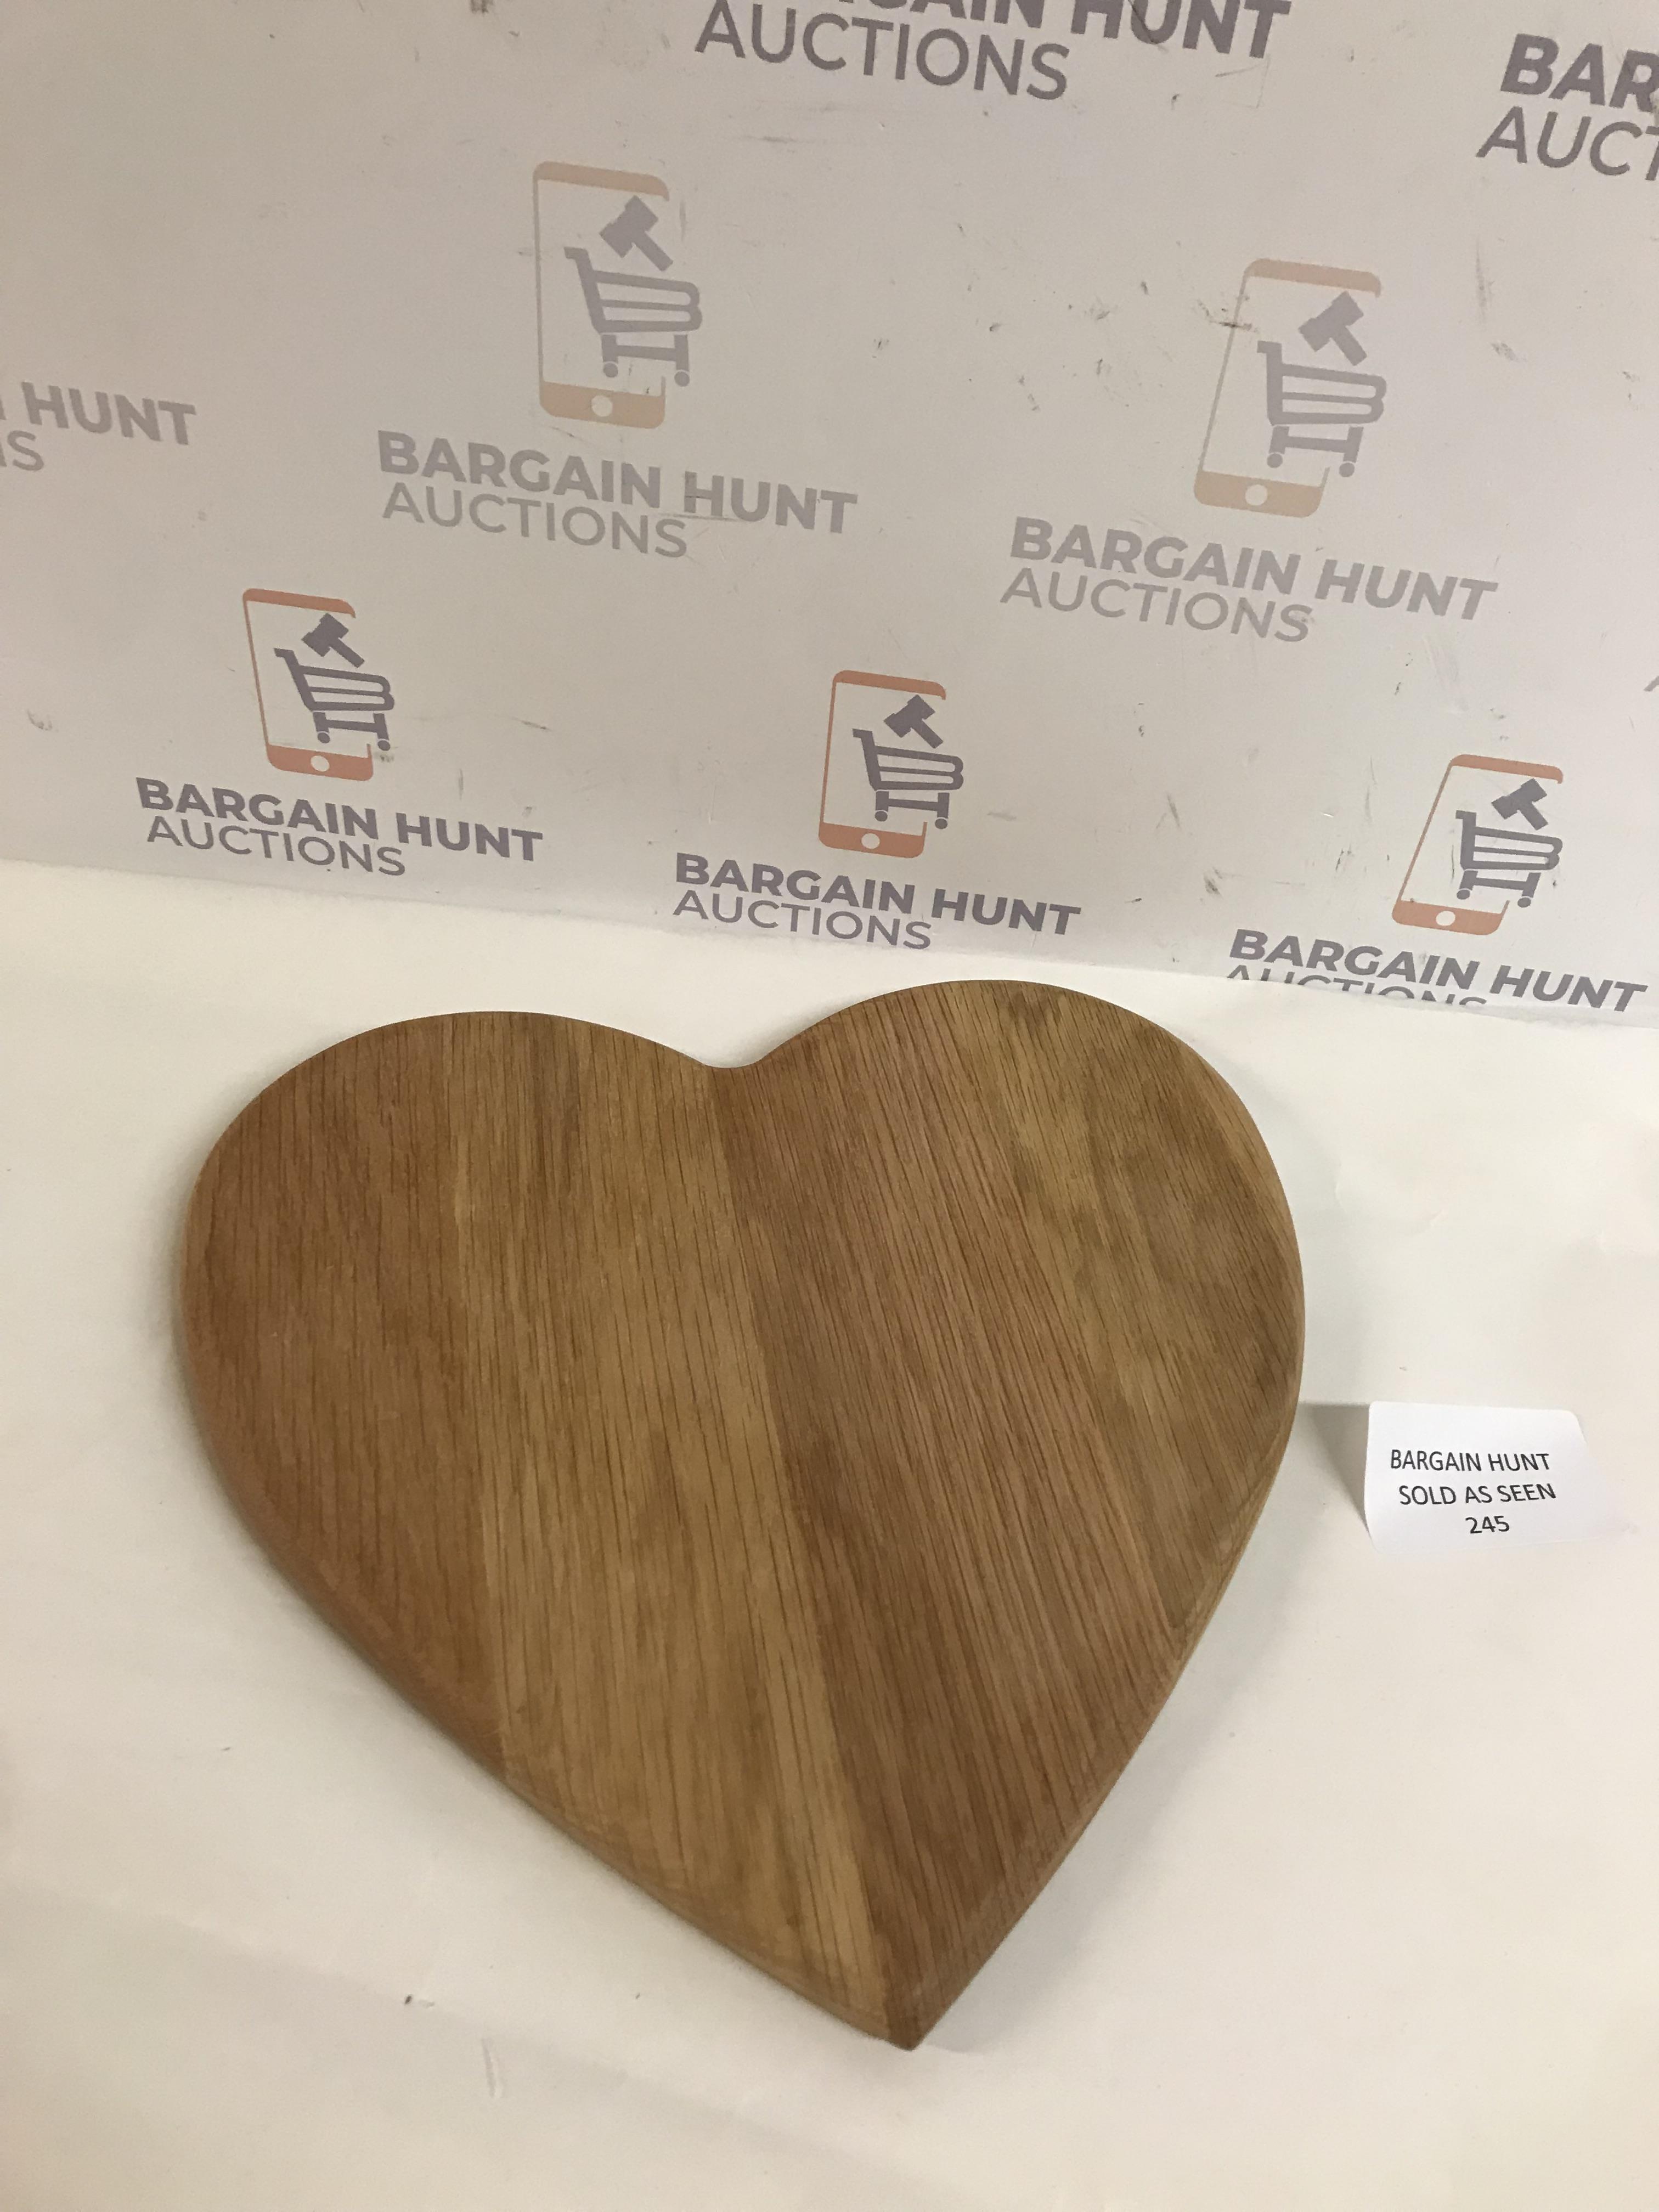 Lot 245 - Heart Shaped Chopping Board